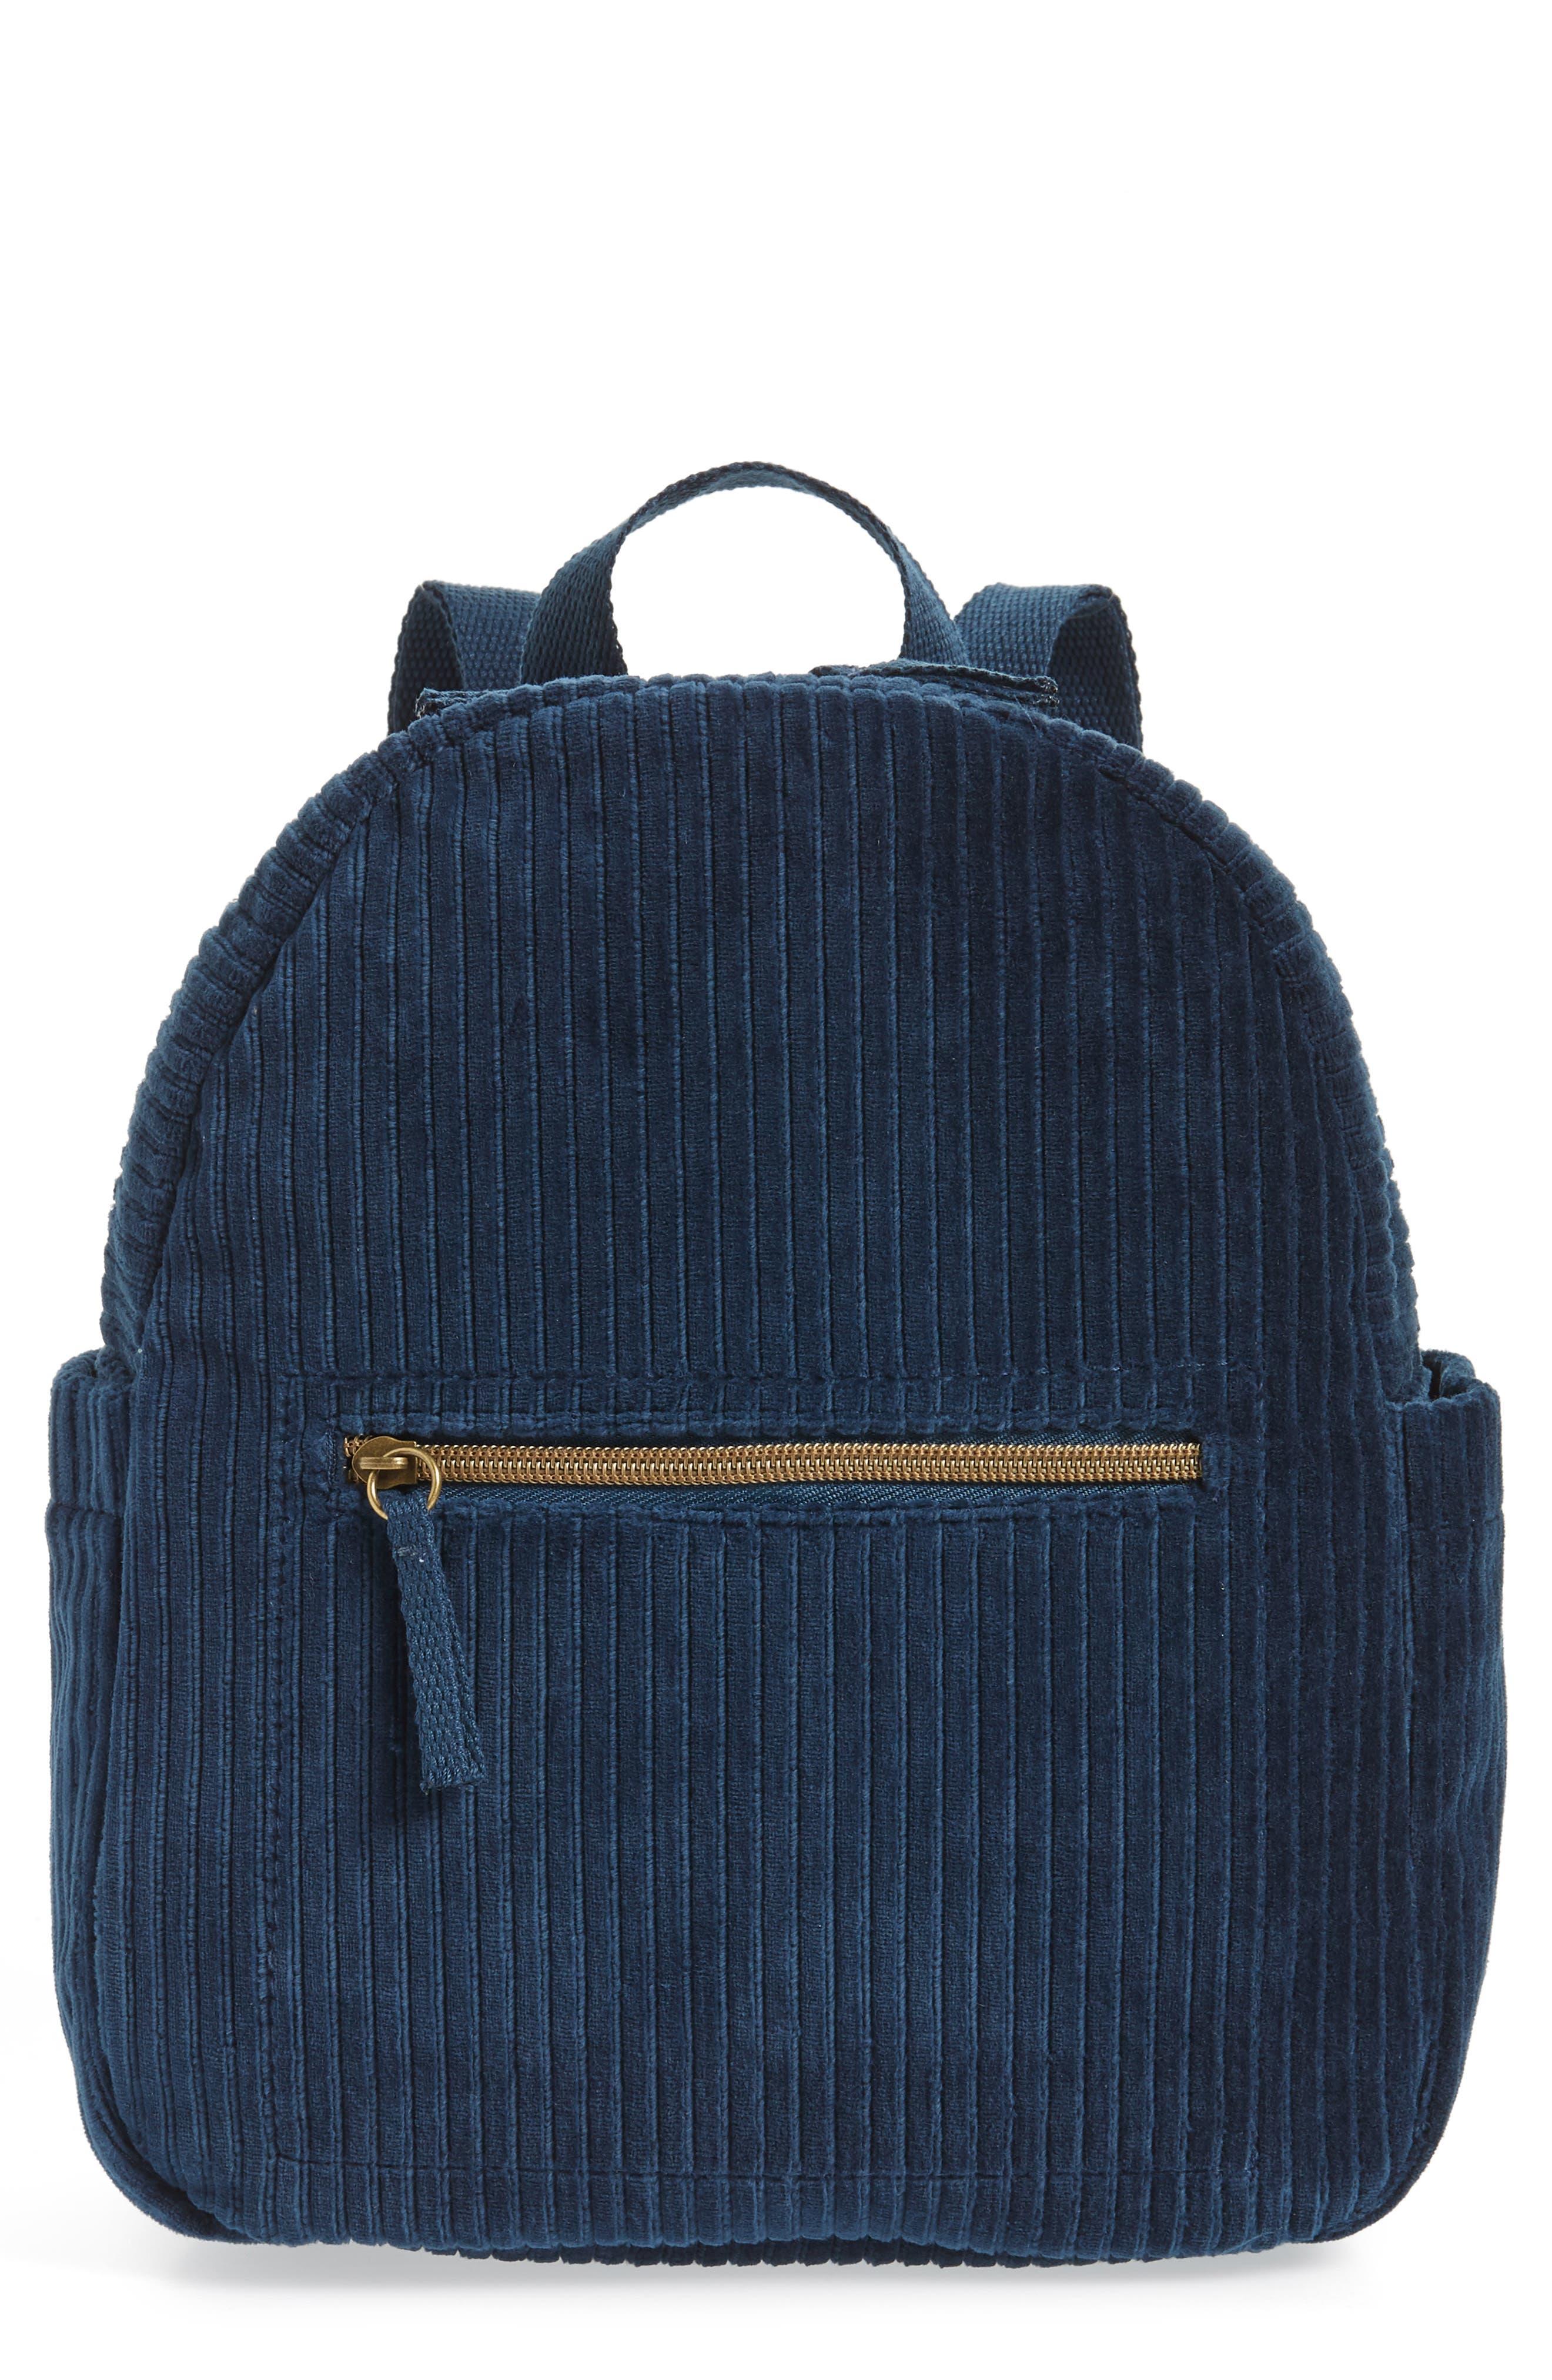 Corduroy Mini Backpack,                             Main thumbnail 1, color,                             440